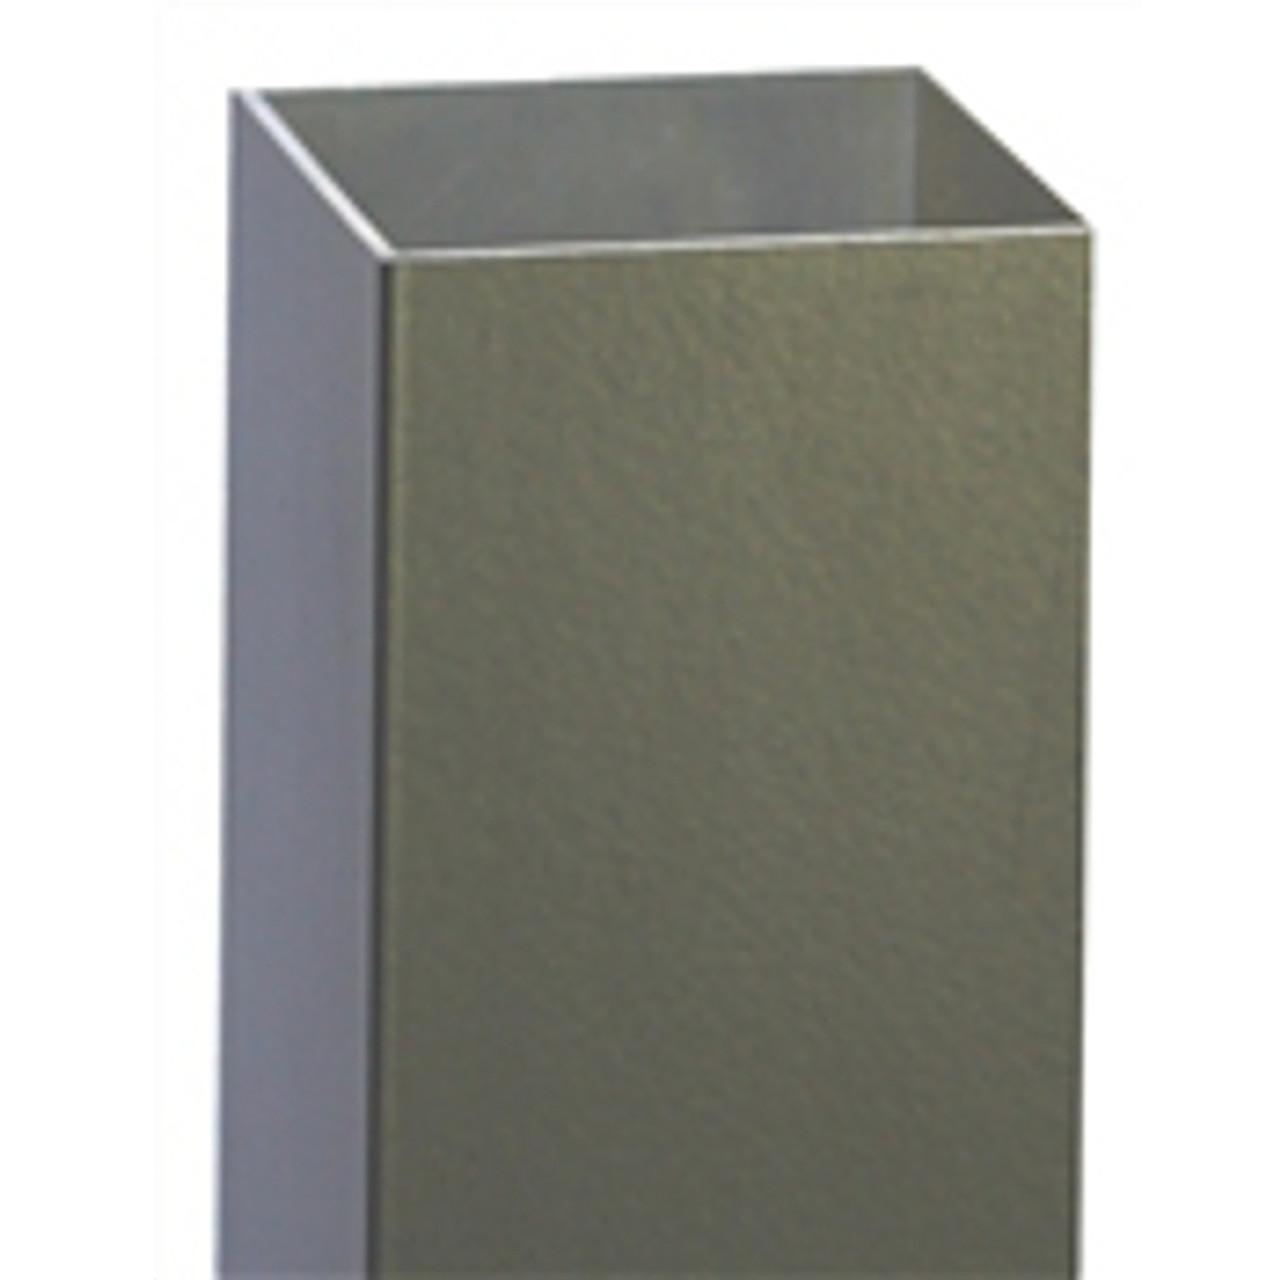 Regis 3131 2 x 2 Routed Aluminum Fence Posts